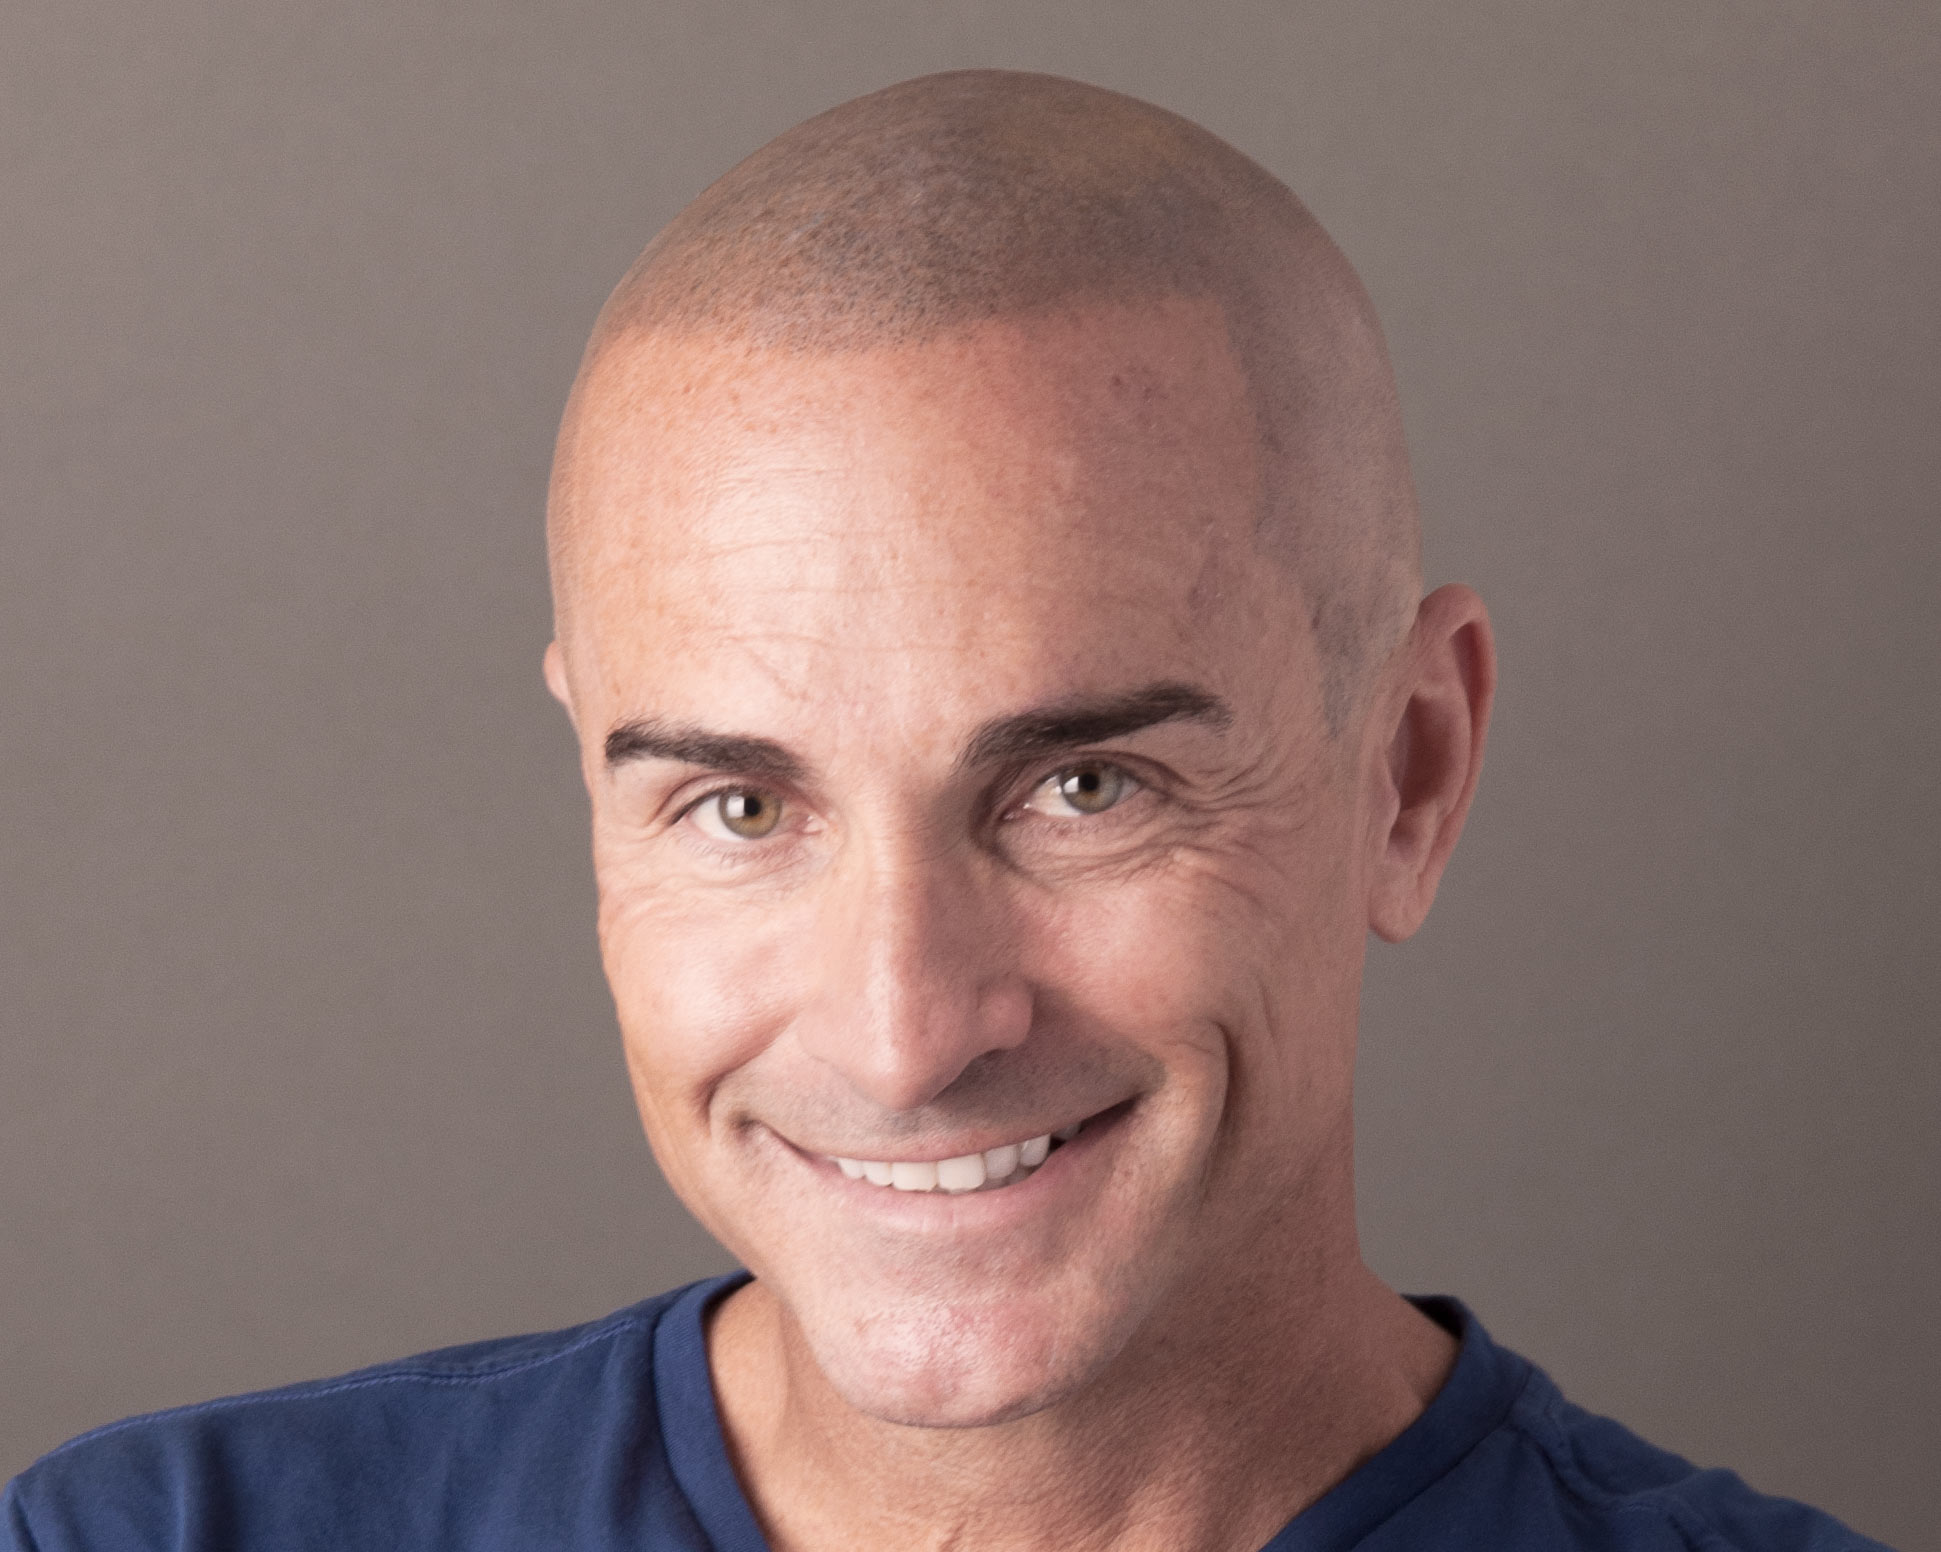 Scalp Micropigmentation Smp New Hair Institute Hair